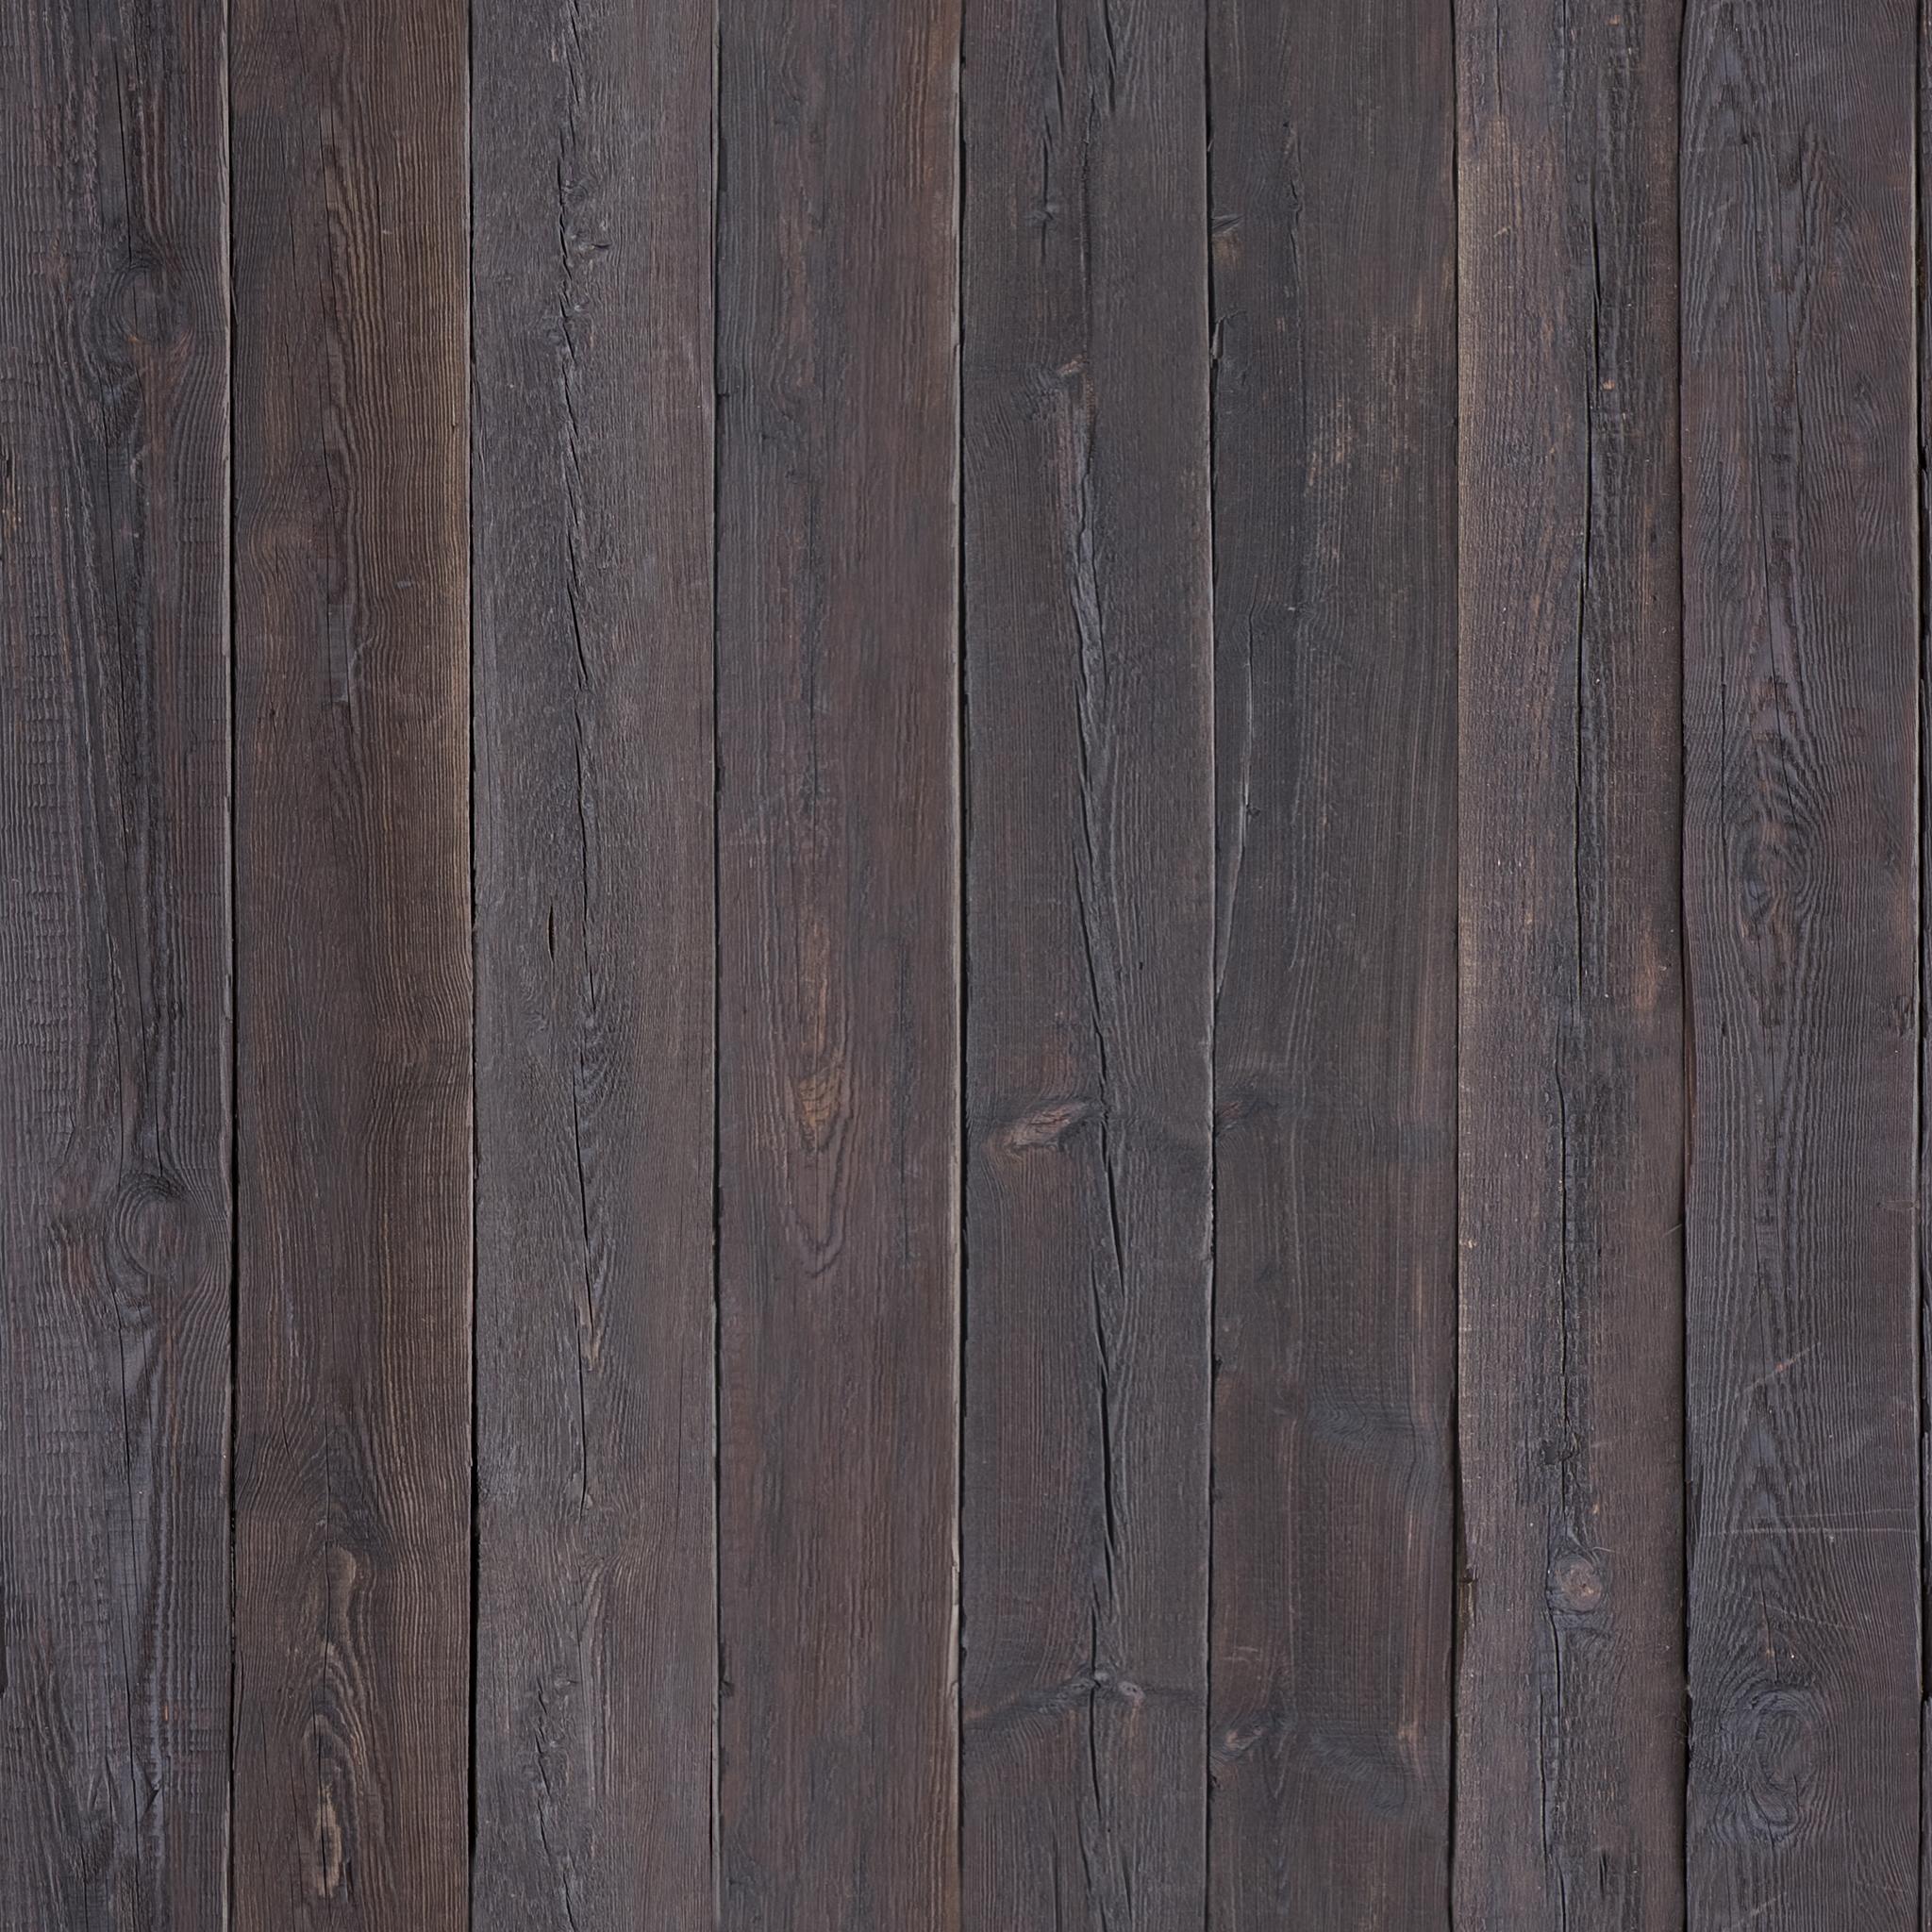 wood plank texture seamless. Seamless Wooden Planks Textures Wood Plank Texture